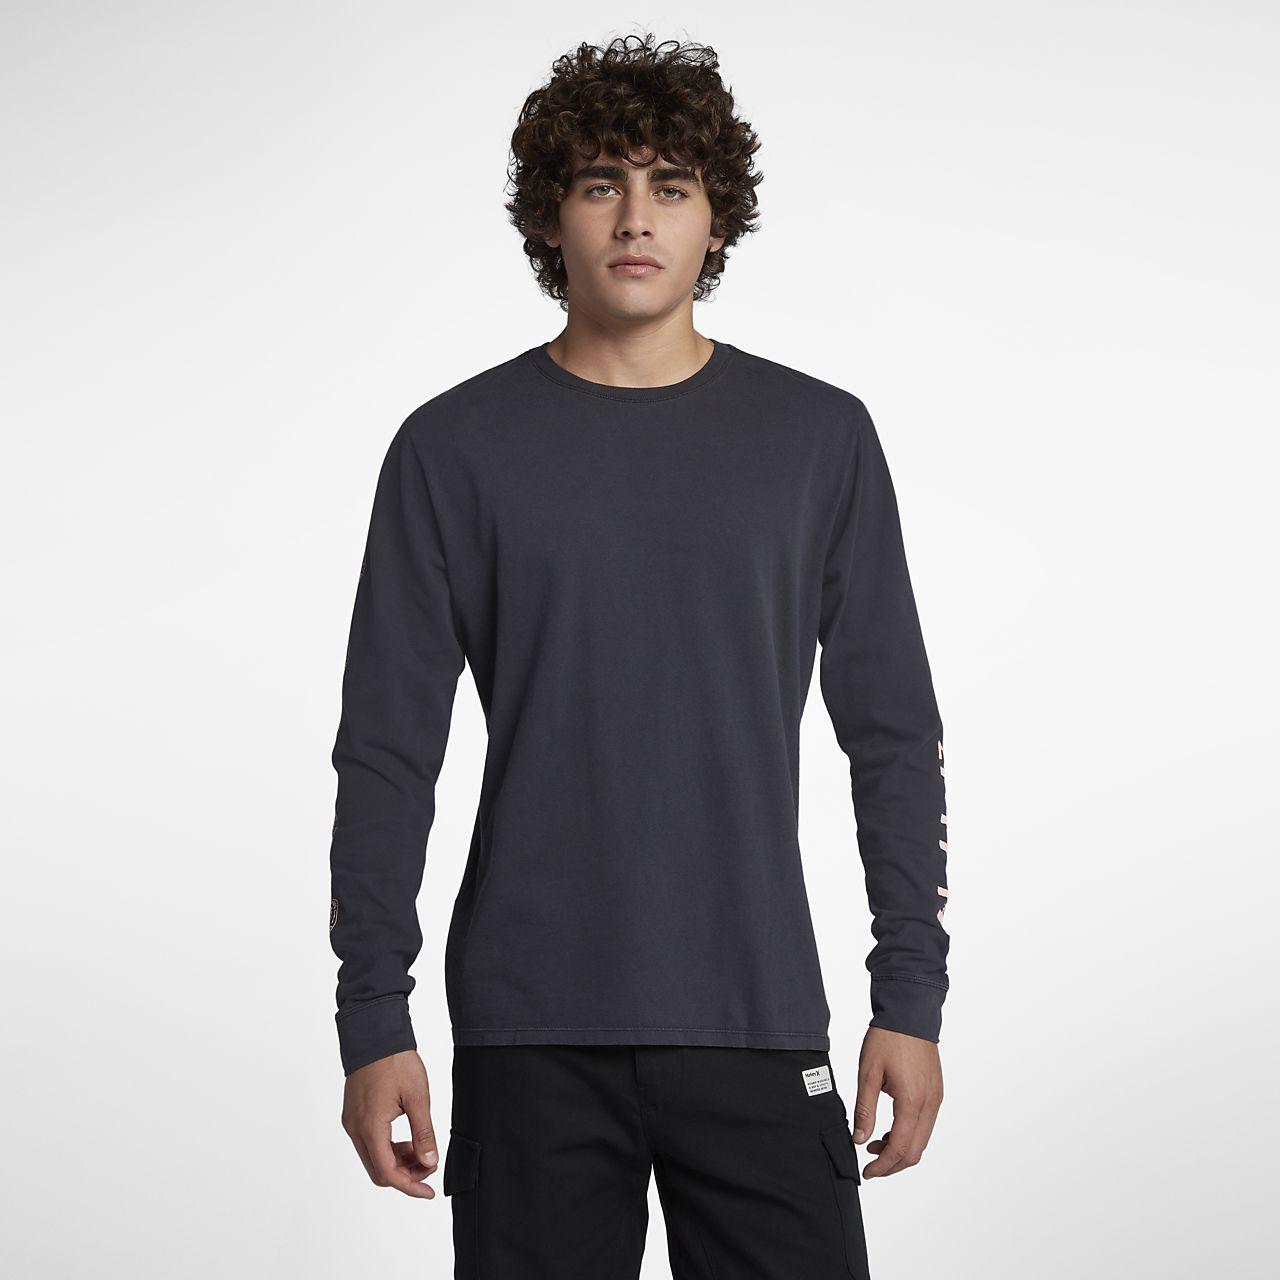 Hurley Heavy Cool Summer Men's Long Sleeve T-Shirt